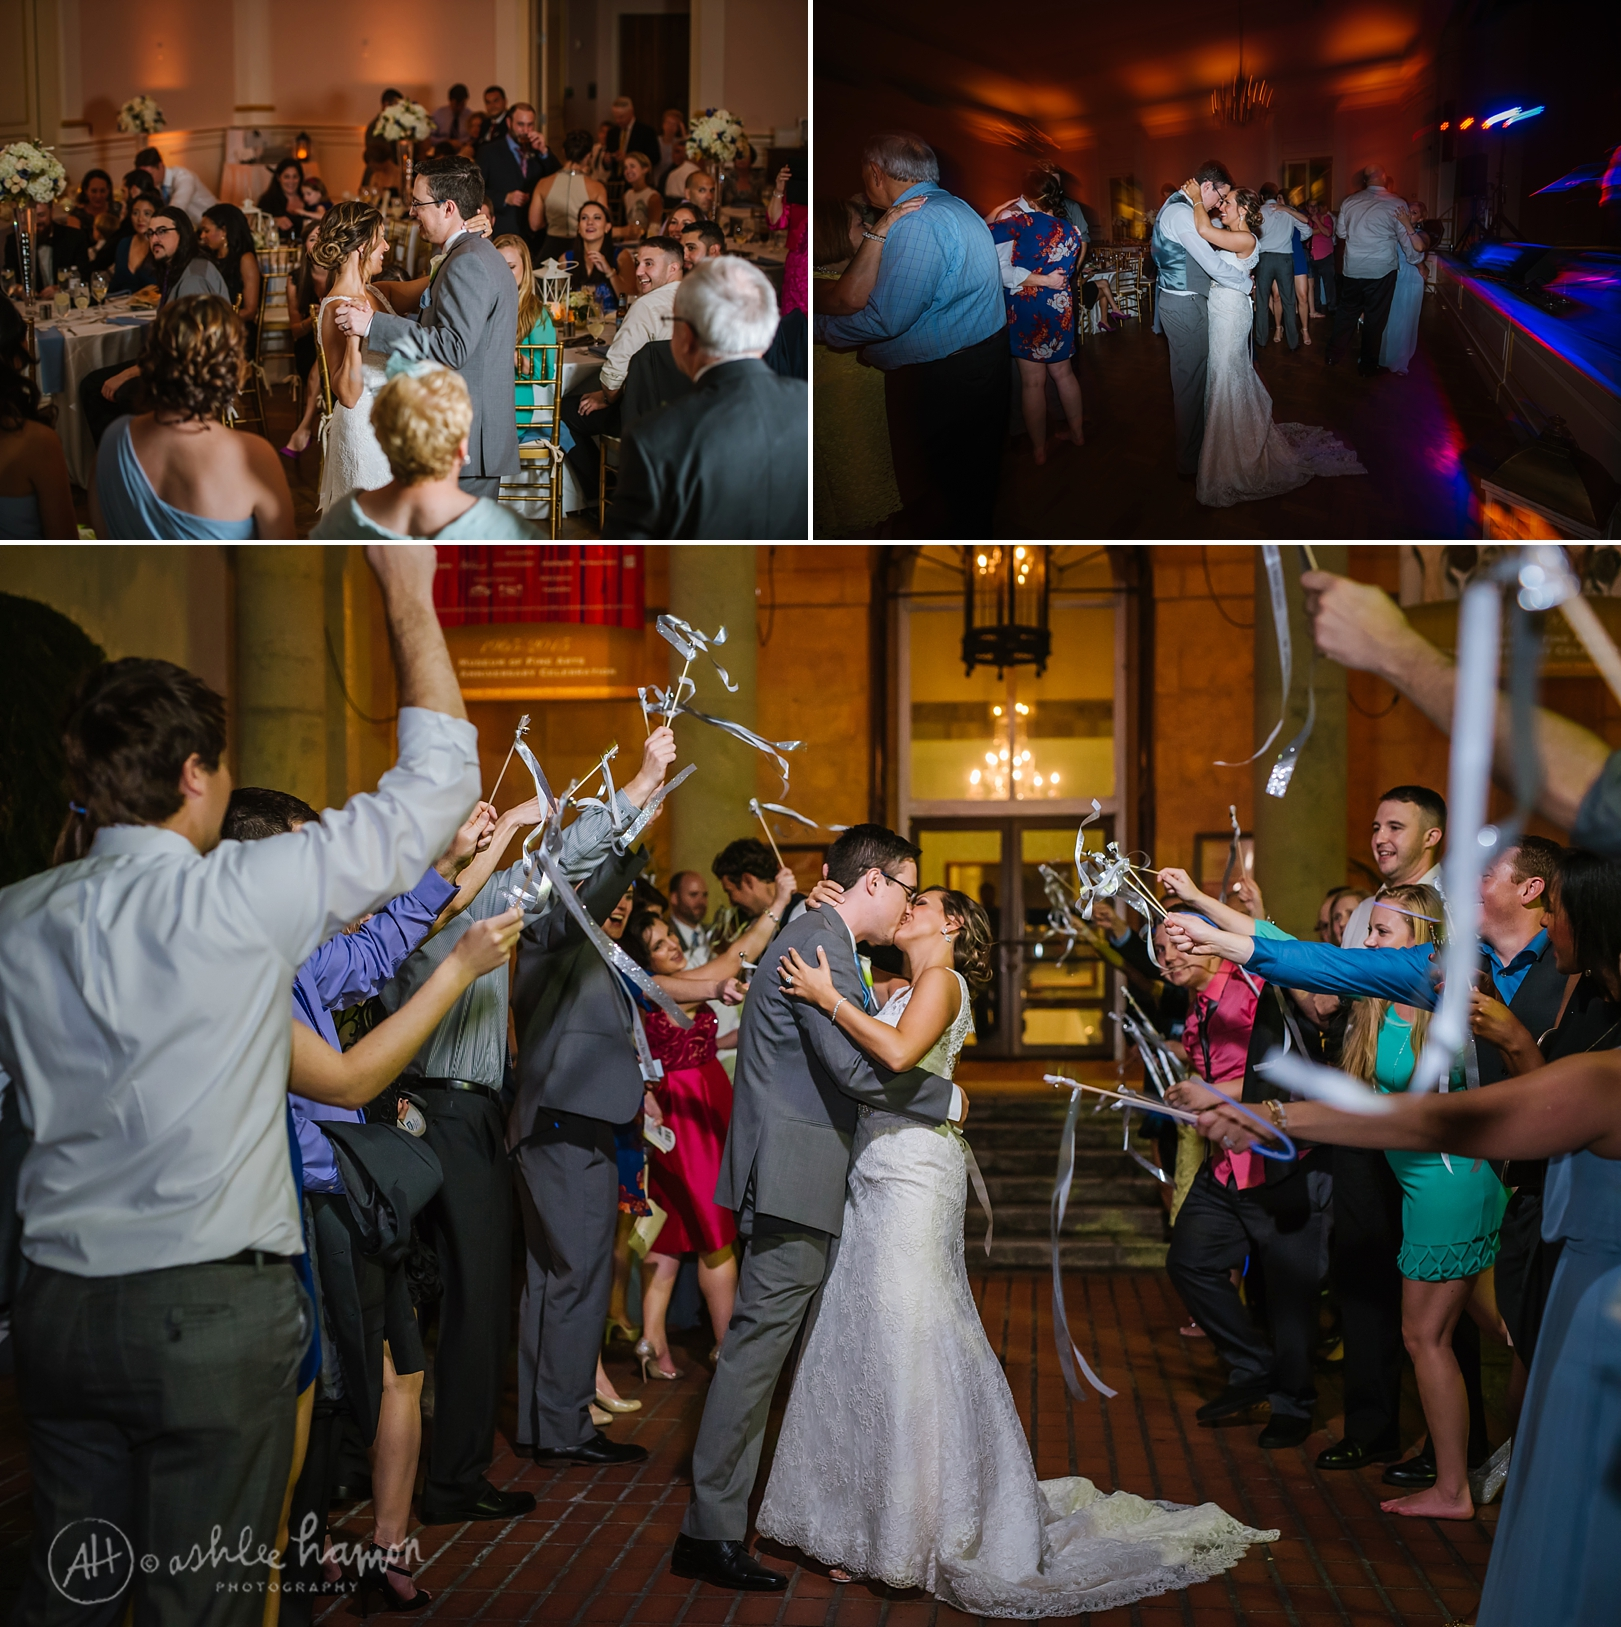 st-pete-art-museum-wedding-vinoy-ashlee-hamon-photography_0019.jpg